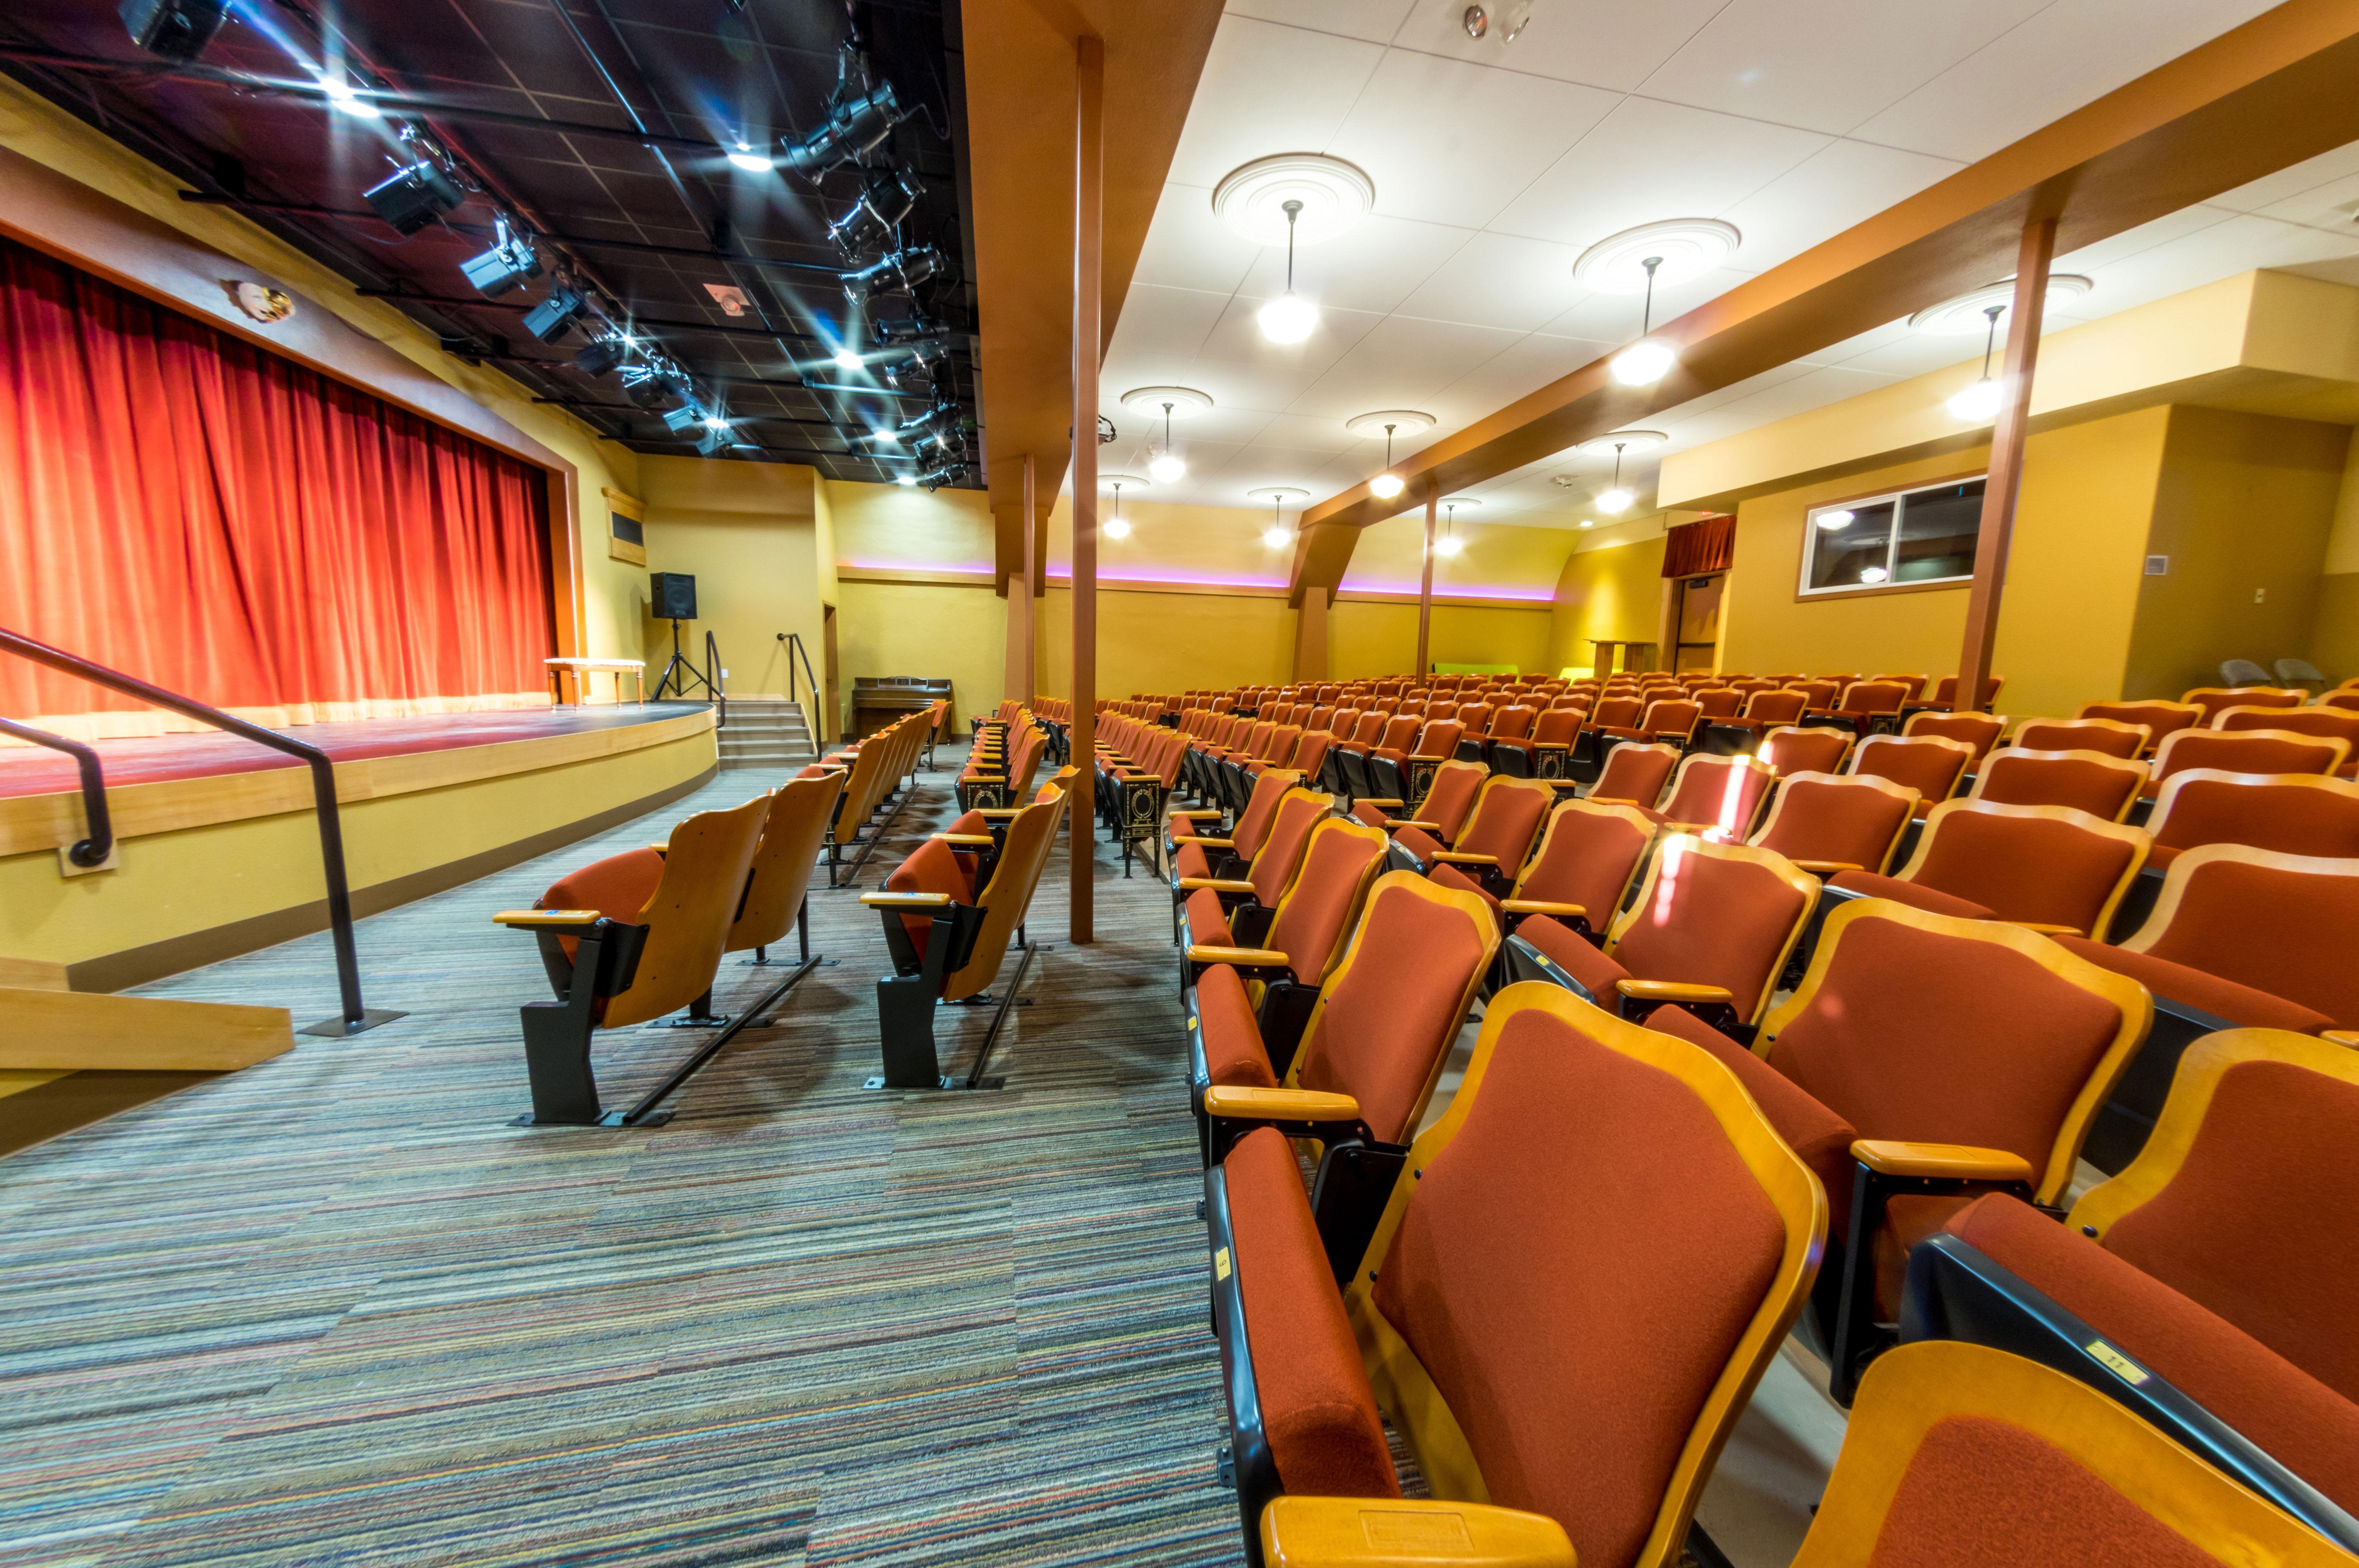 Performing Arts Center at NCRD